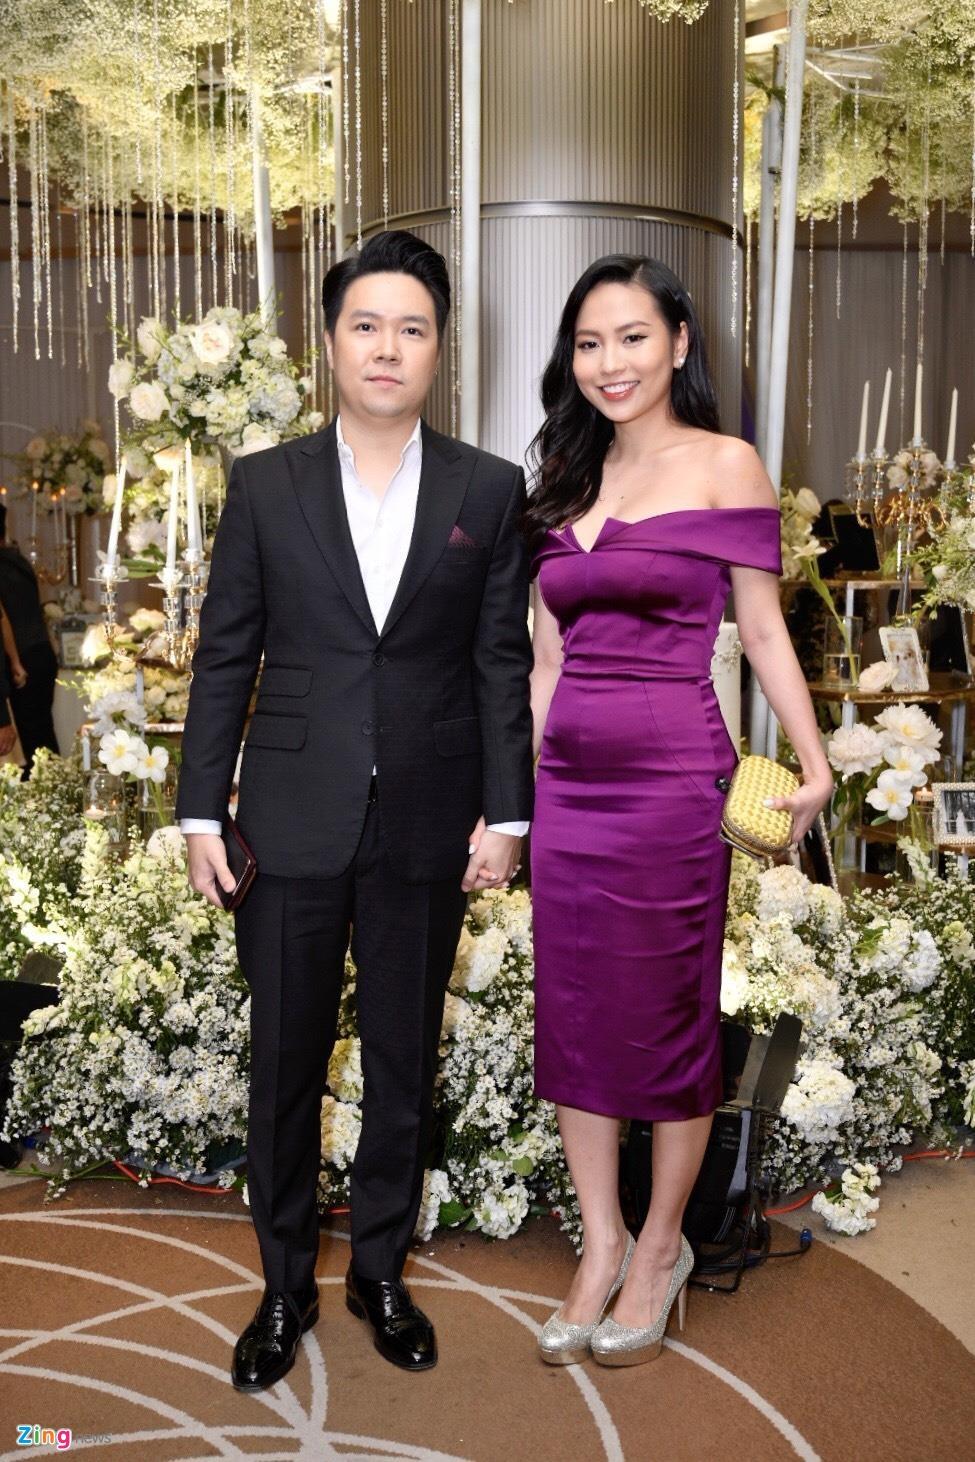 Tran Thanh cung dan sao du tiec cuoi cua Duong Khac Linh va Sara Luu hinh anh 5